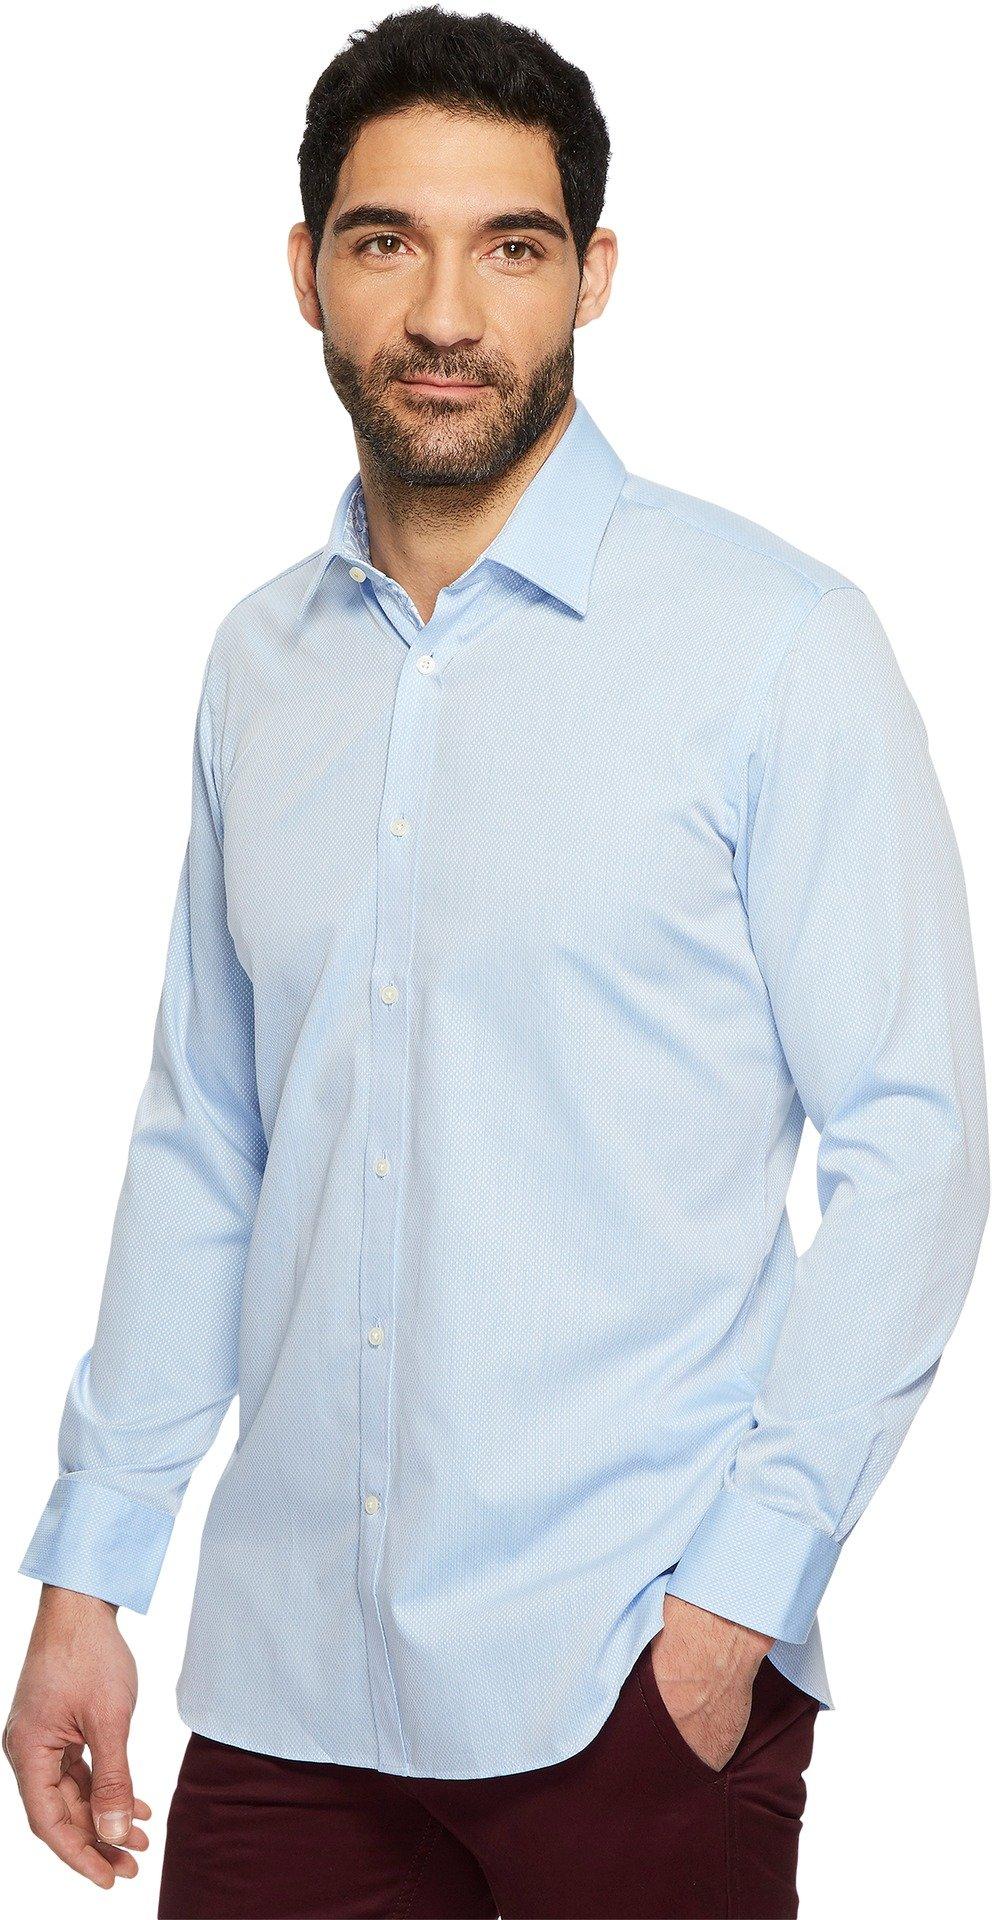 Ted Baker Men's oaker Textured Solid Dress Shirt Blue 17.5-34/35 by Ted Baker (Image #2)